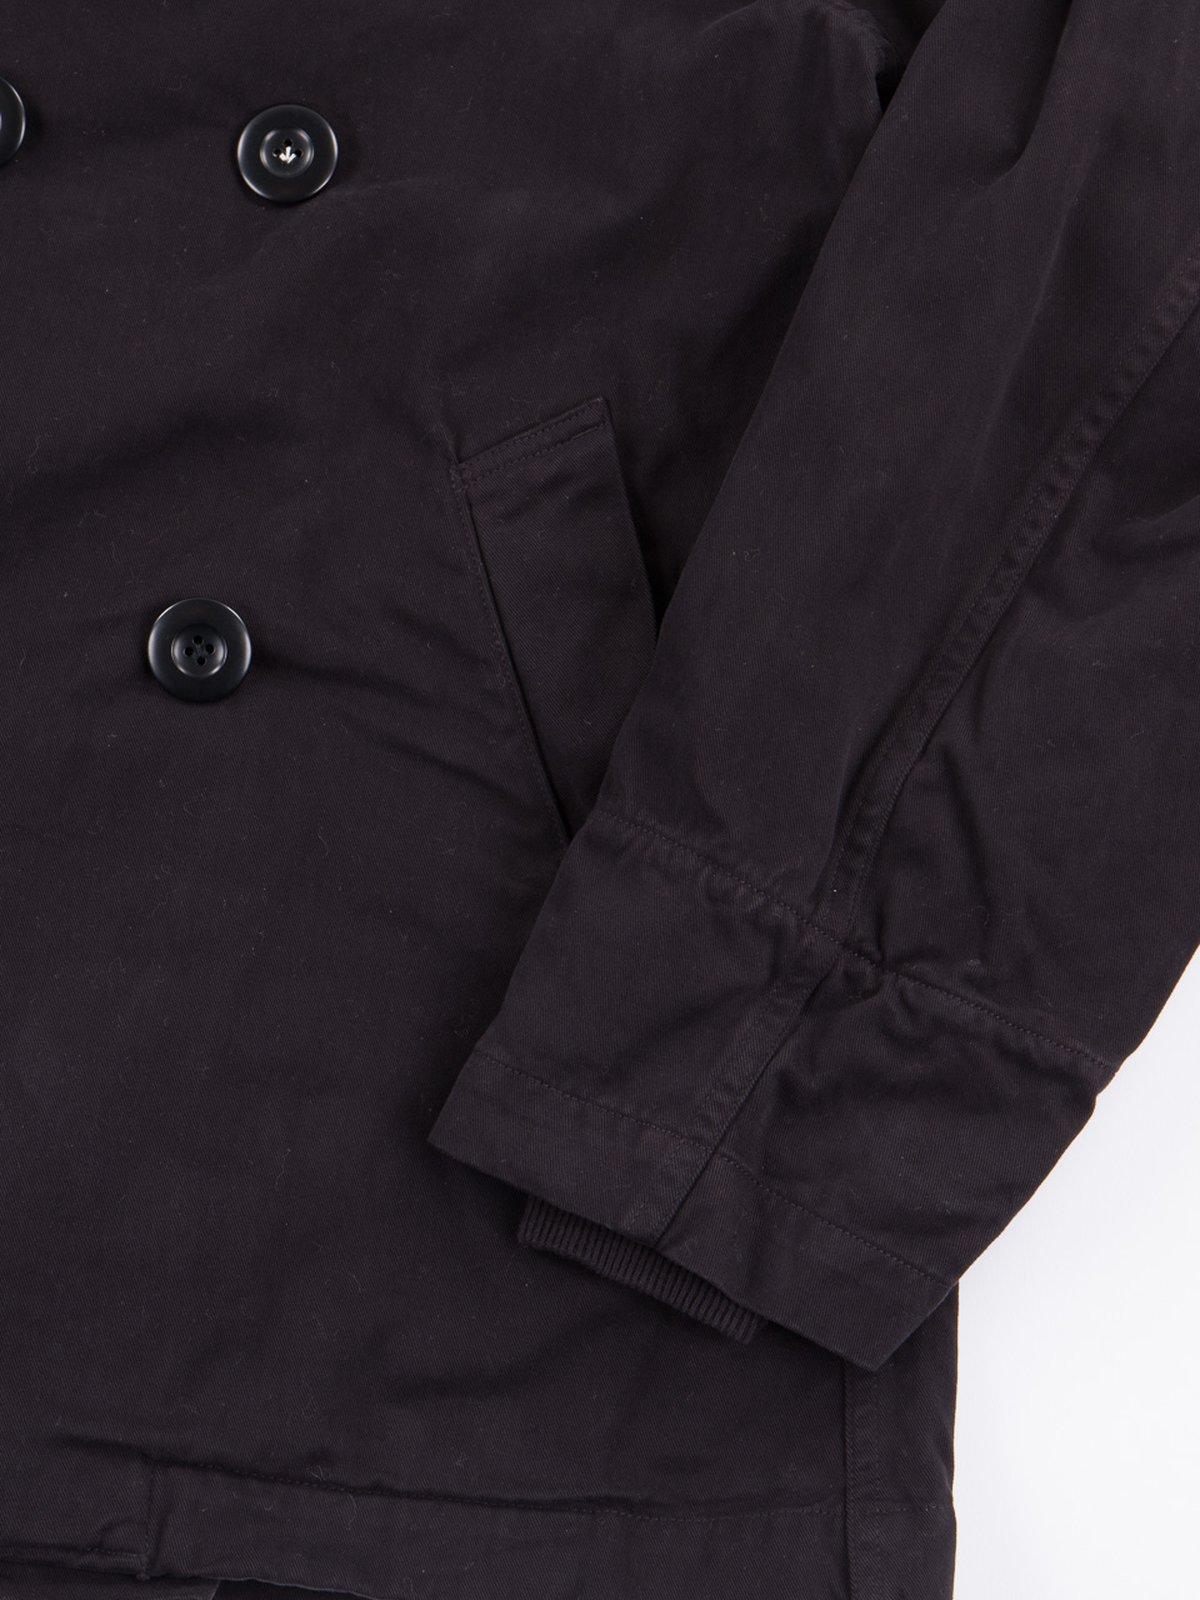 Black Brushed Twill Tri–P Ring Coat - Image 3